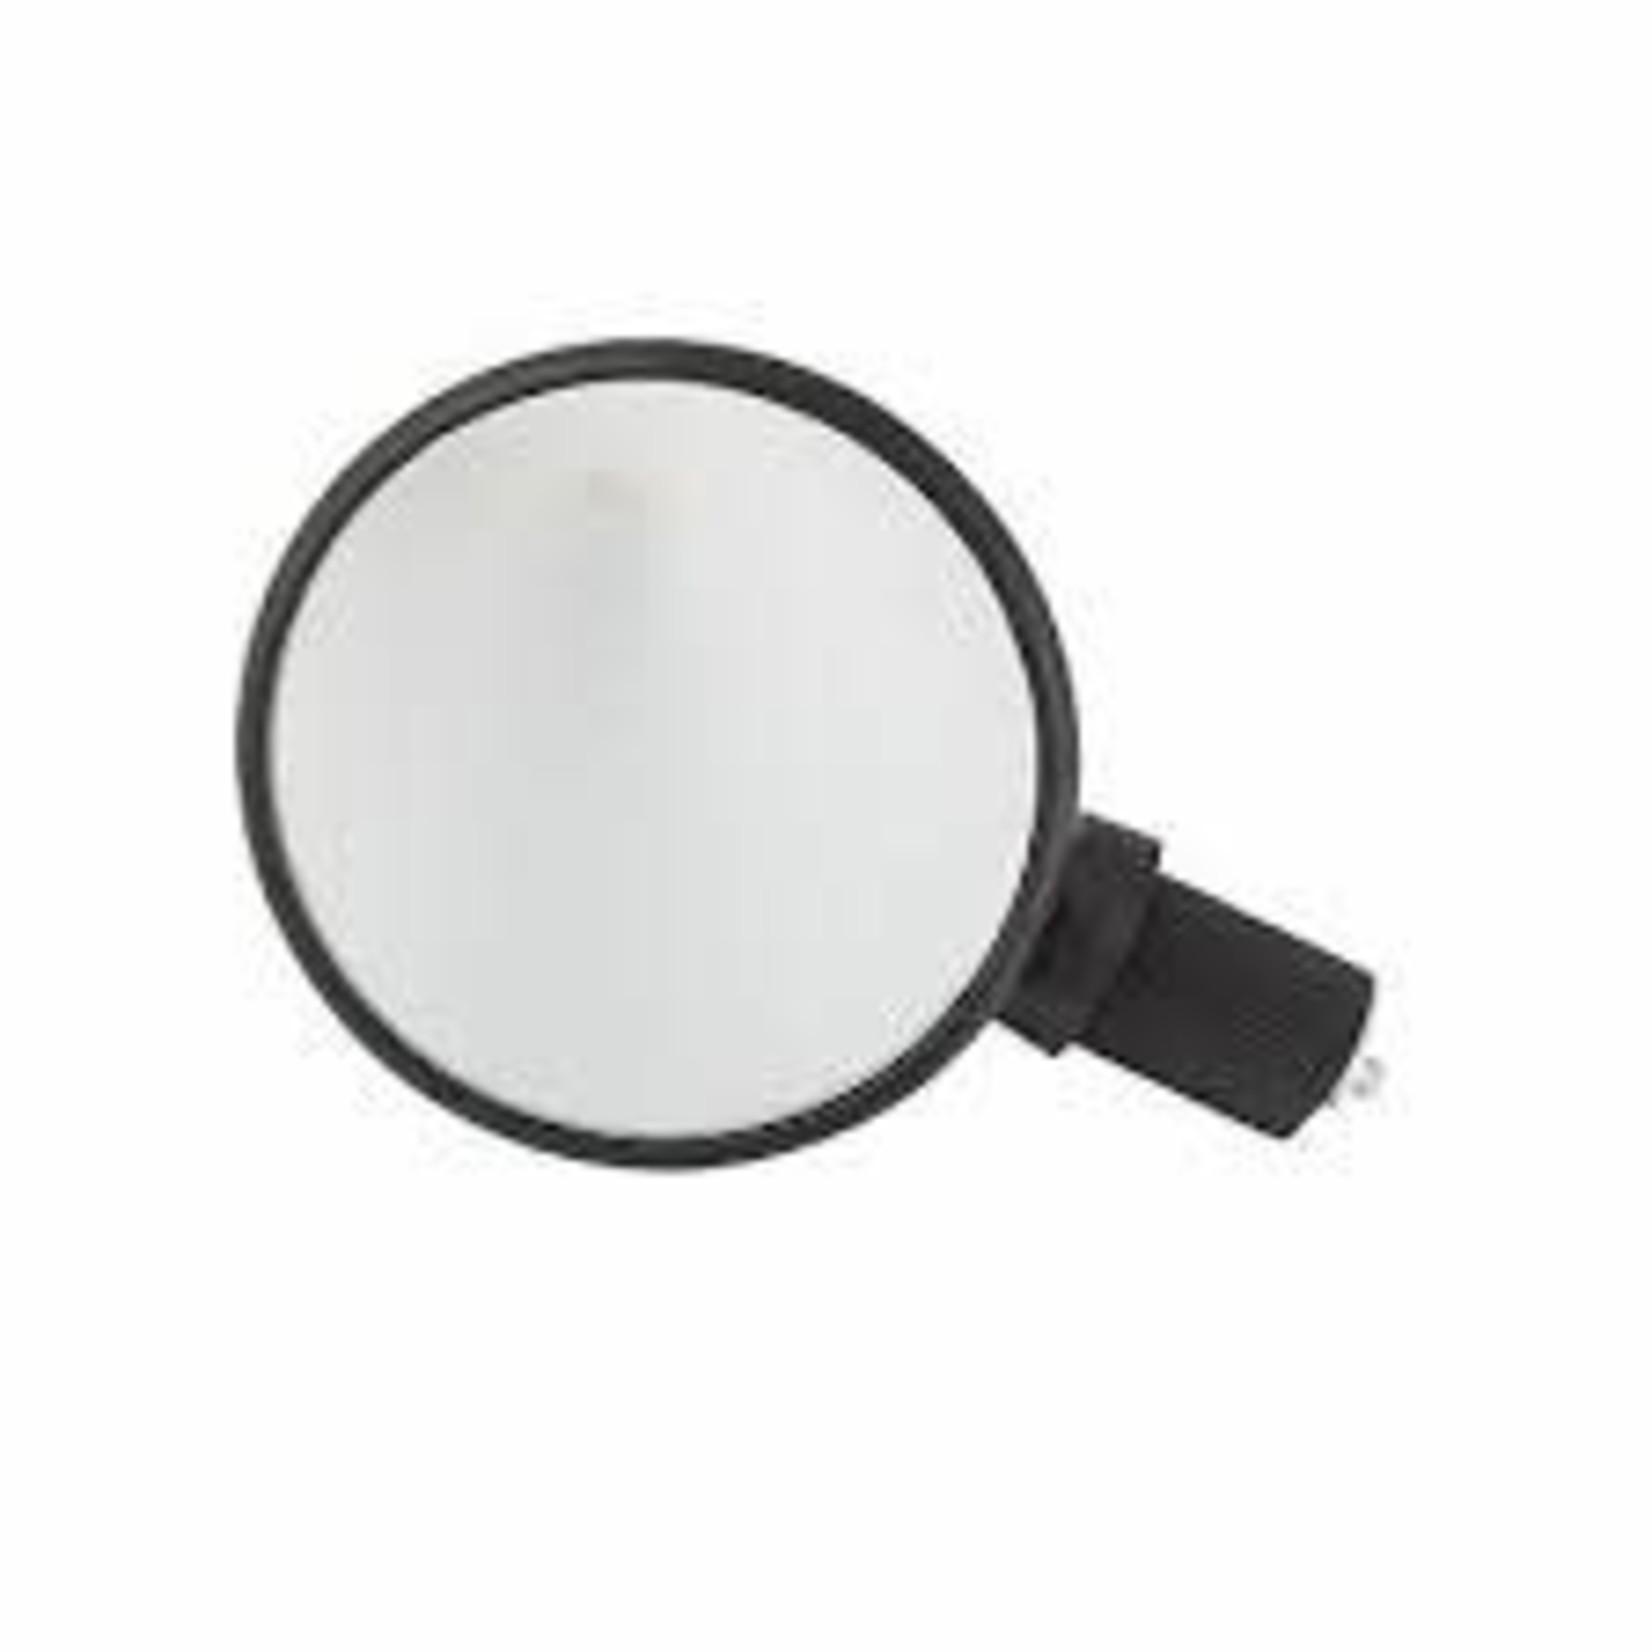 3rd Eye THIRD EYE Handlebar Mirror